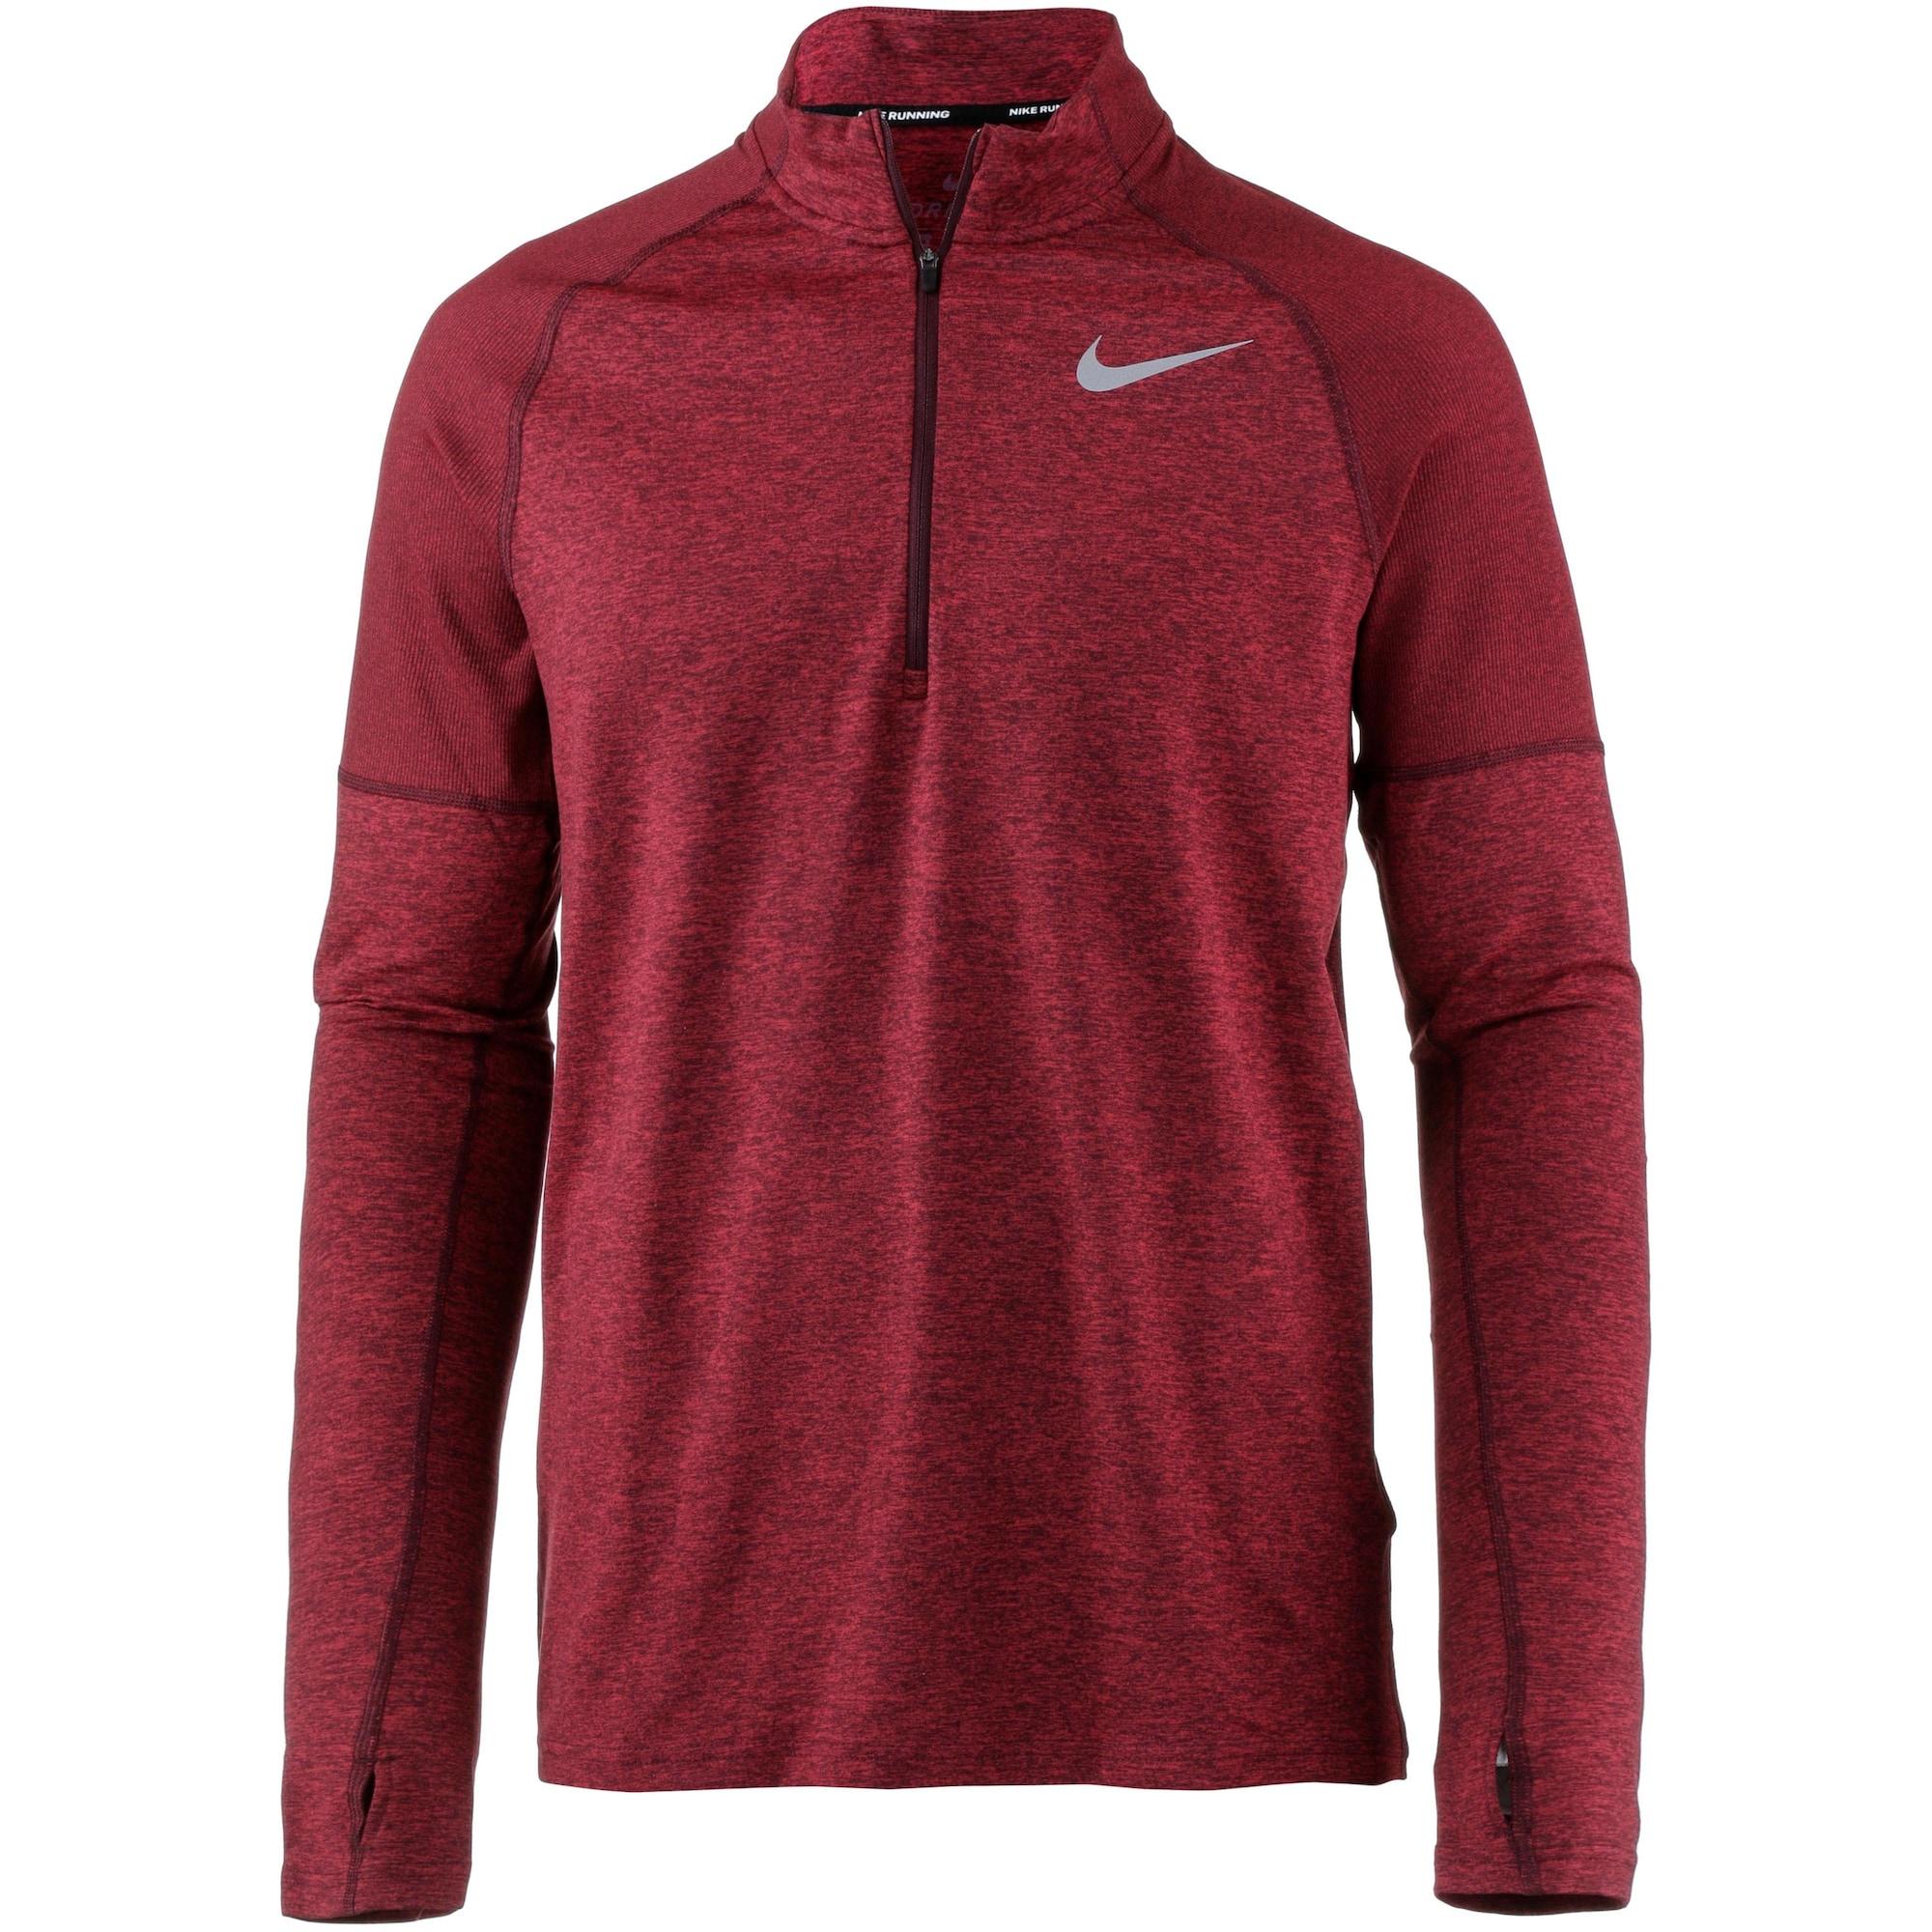 Laufshirt   Sportbekleidung > Sportshirts > Laufshirts   Nike